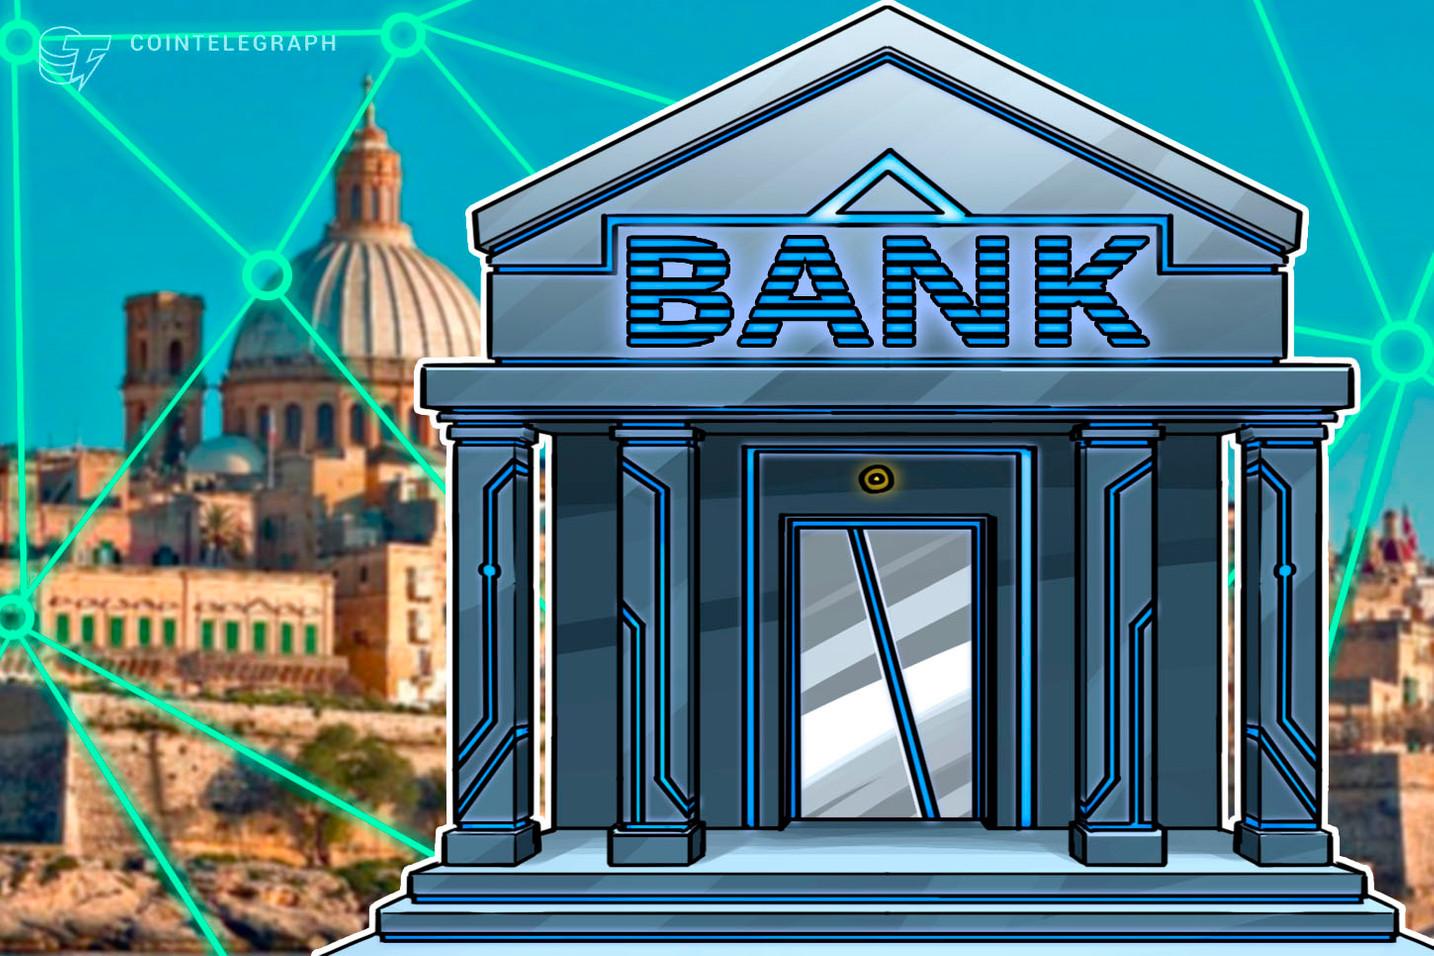 Malta: Kripto berza Binance podržava planove za kreiranje prve decentralizovane, tokenizovane banke